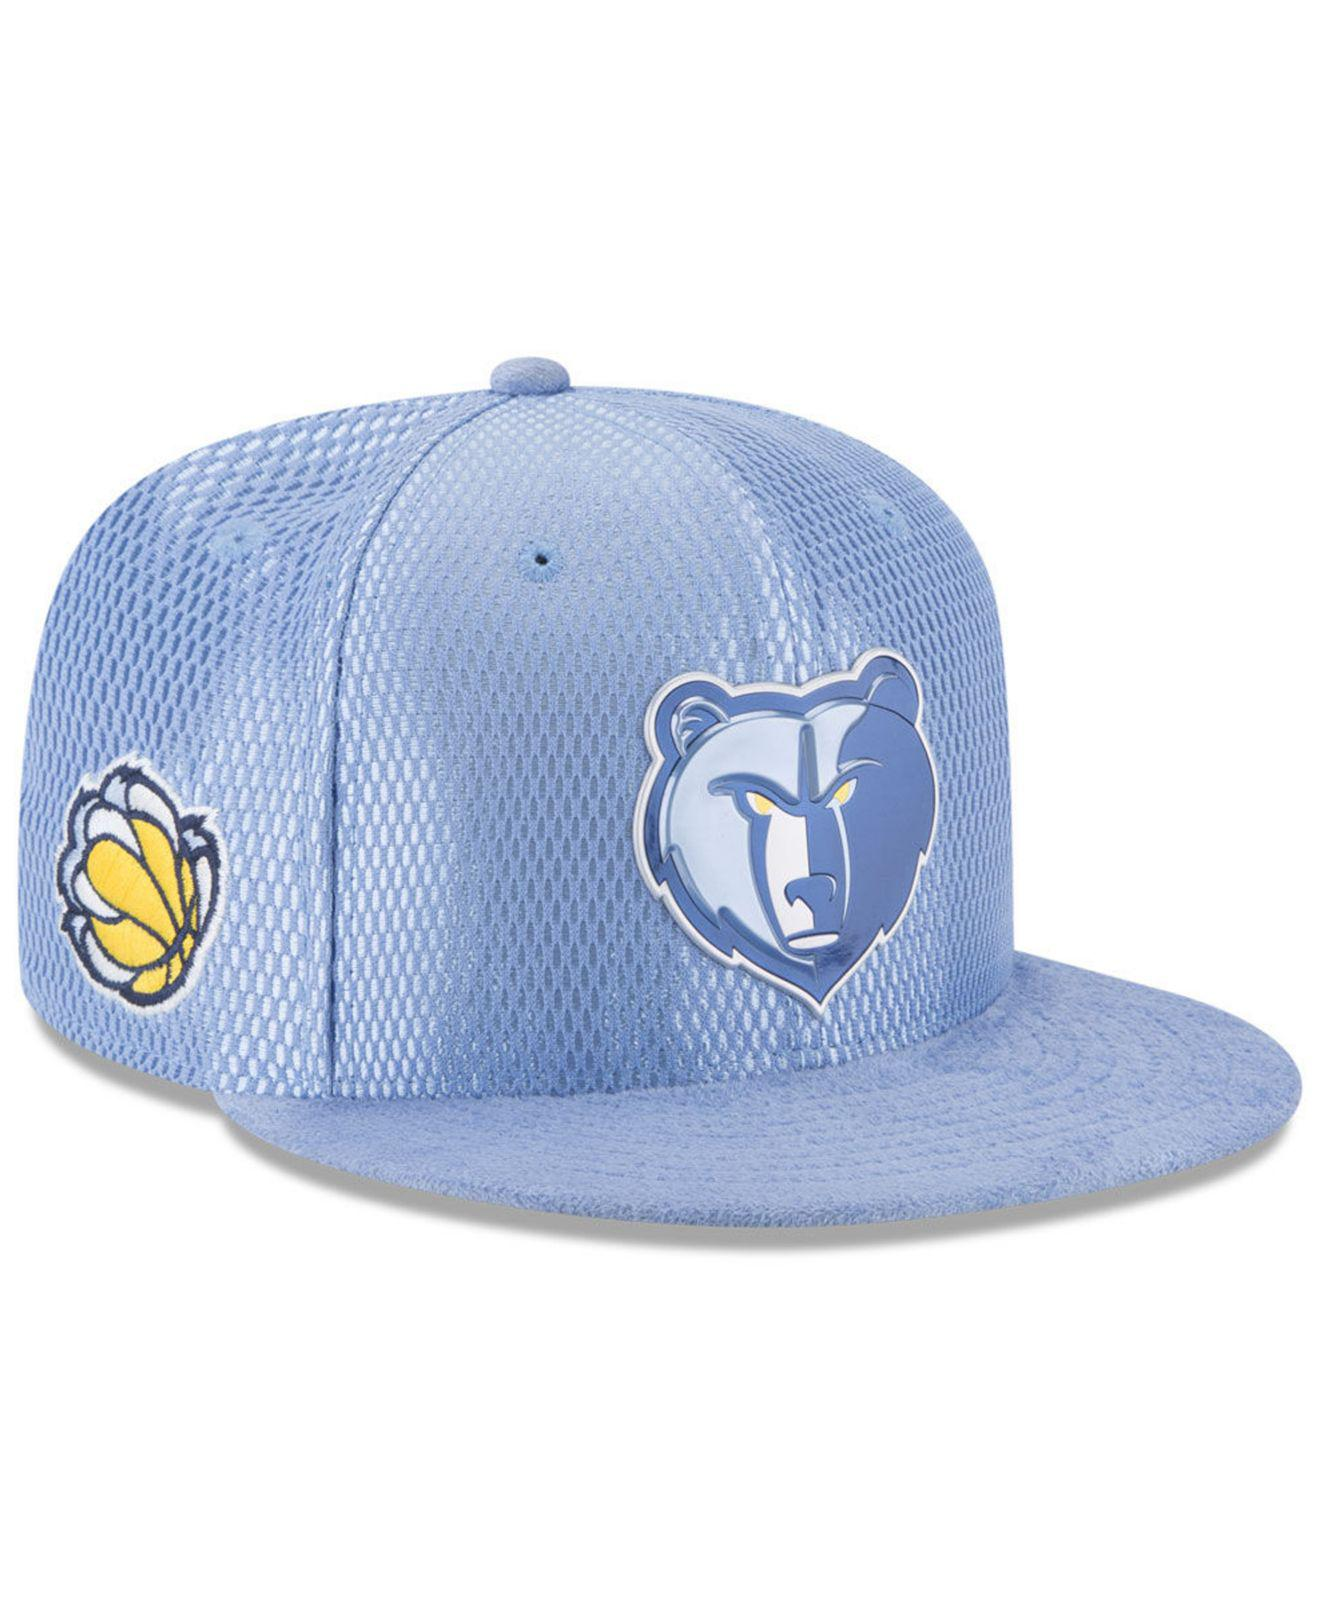 wholesale dealer 3934a fb12f KTZ. Men s Blue On Court Reverse 9fifty Snapback Cap